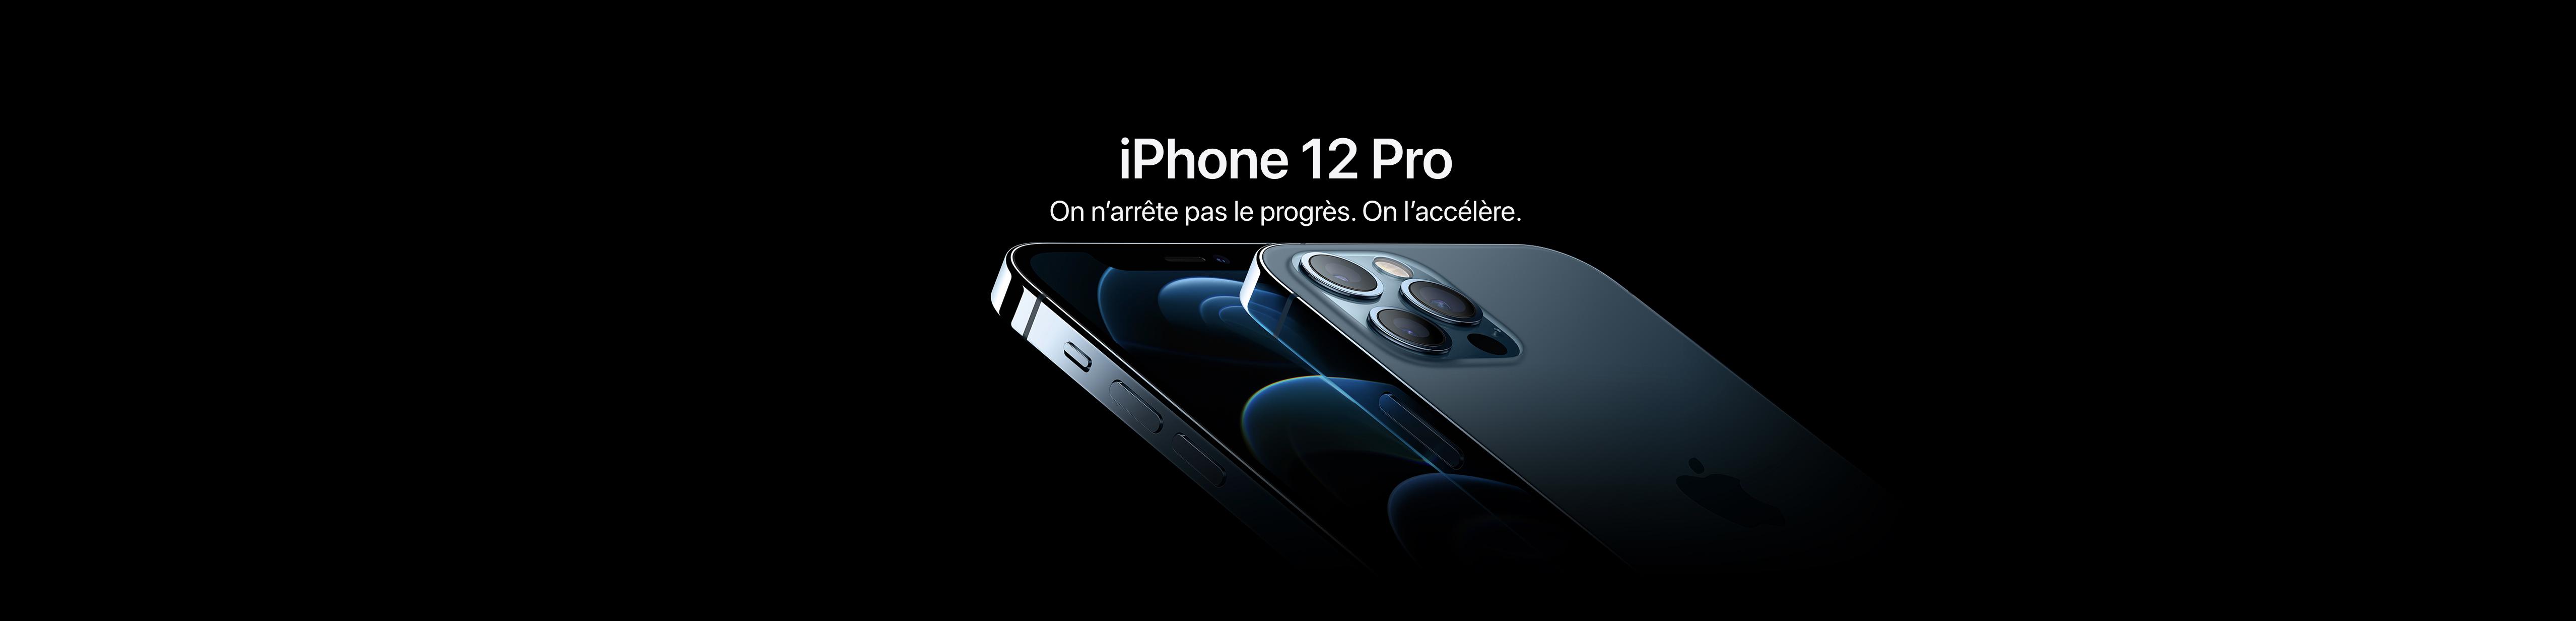 IPHONE PAS CHER 5G AVIGNON VAUCLUSE GARD